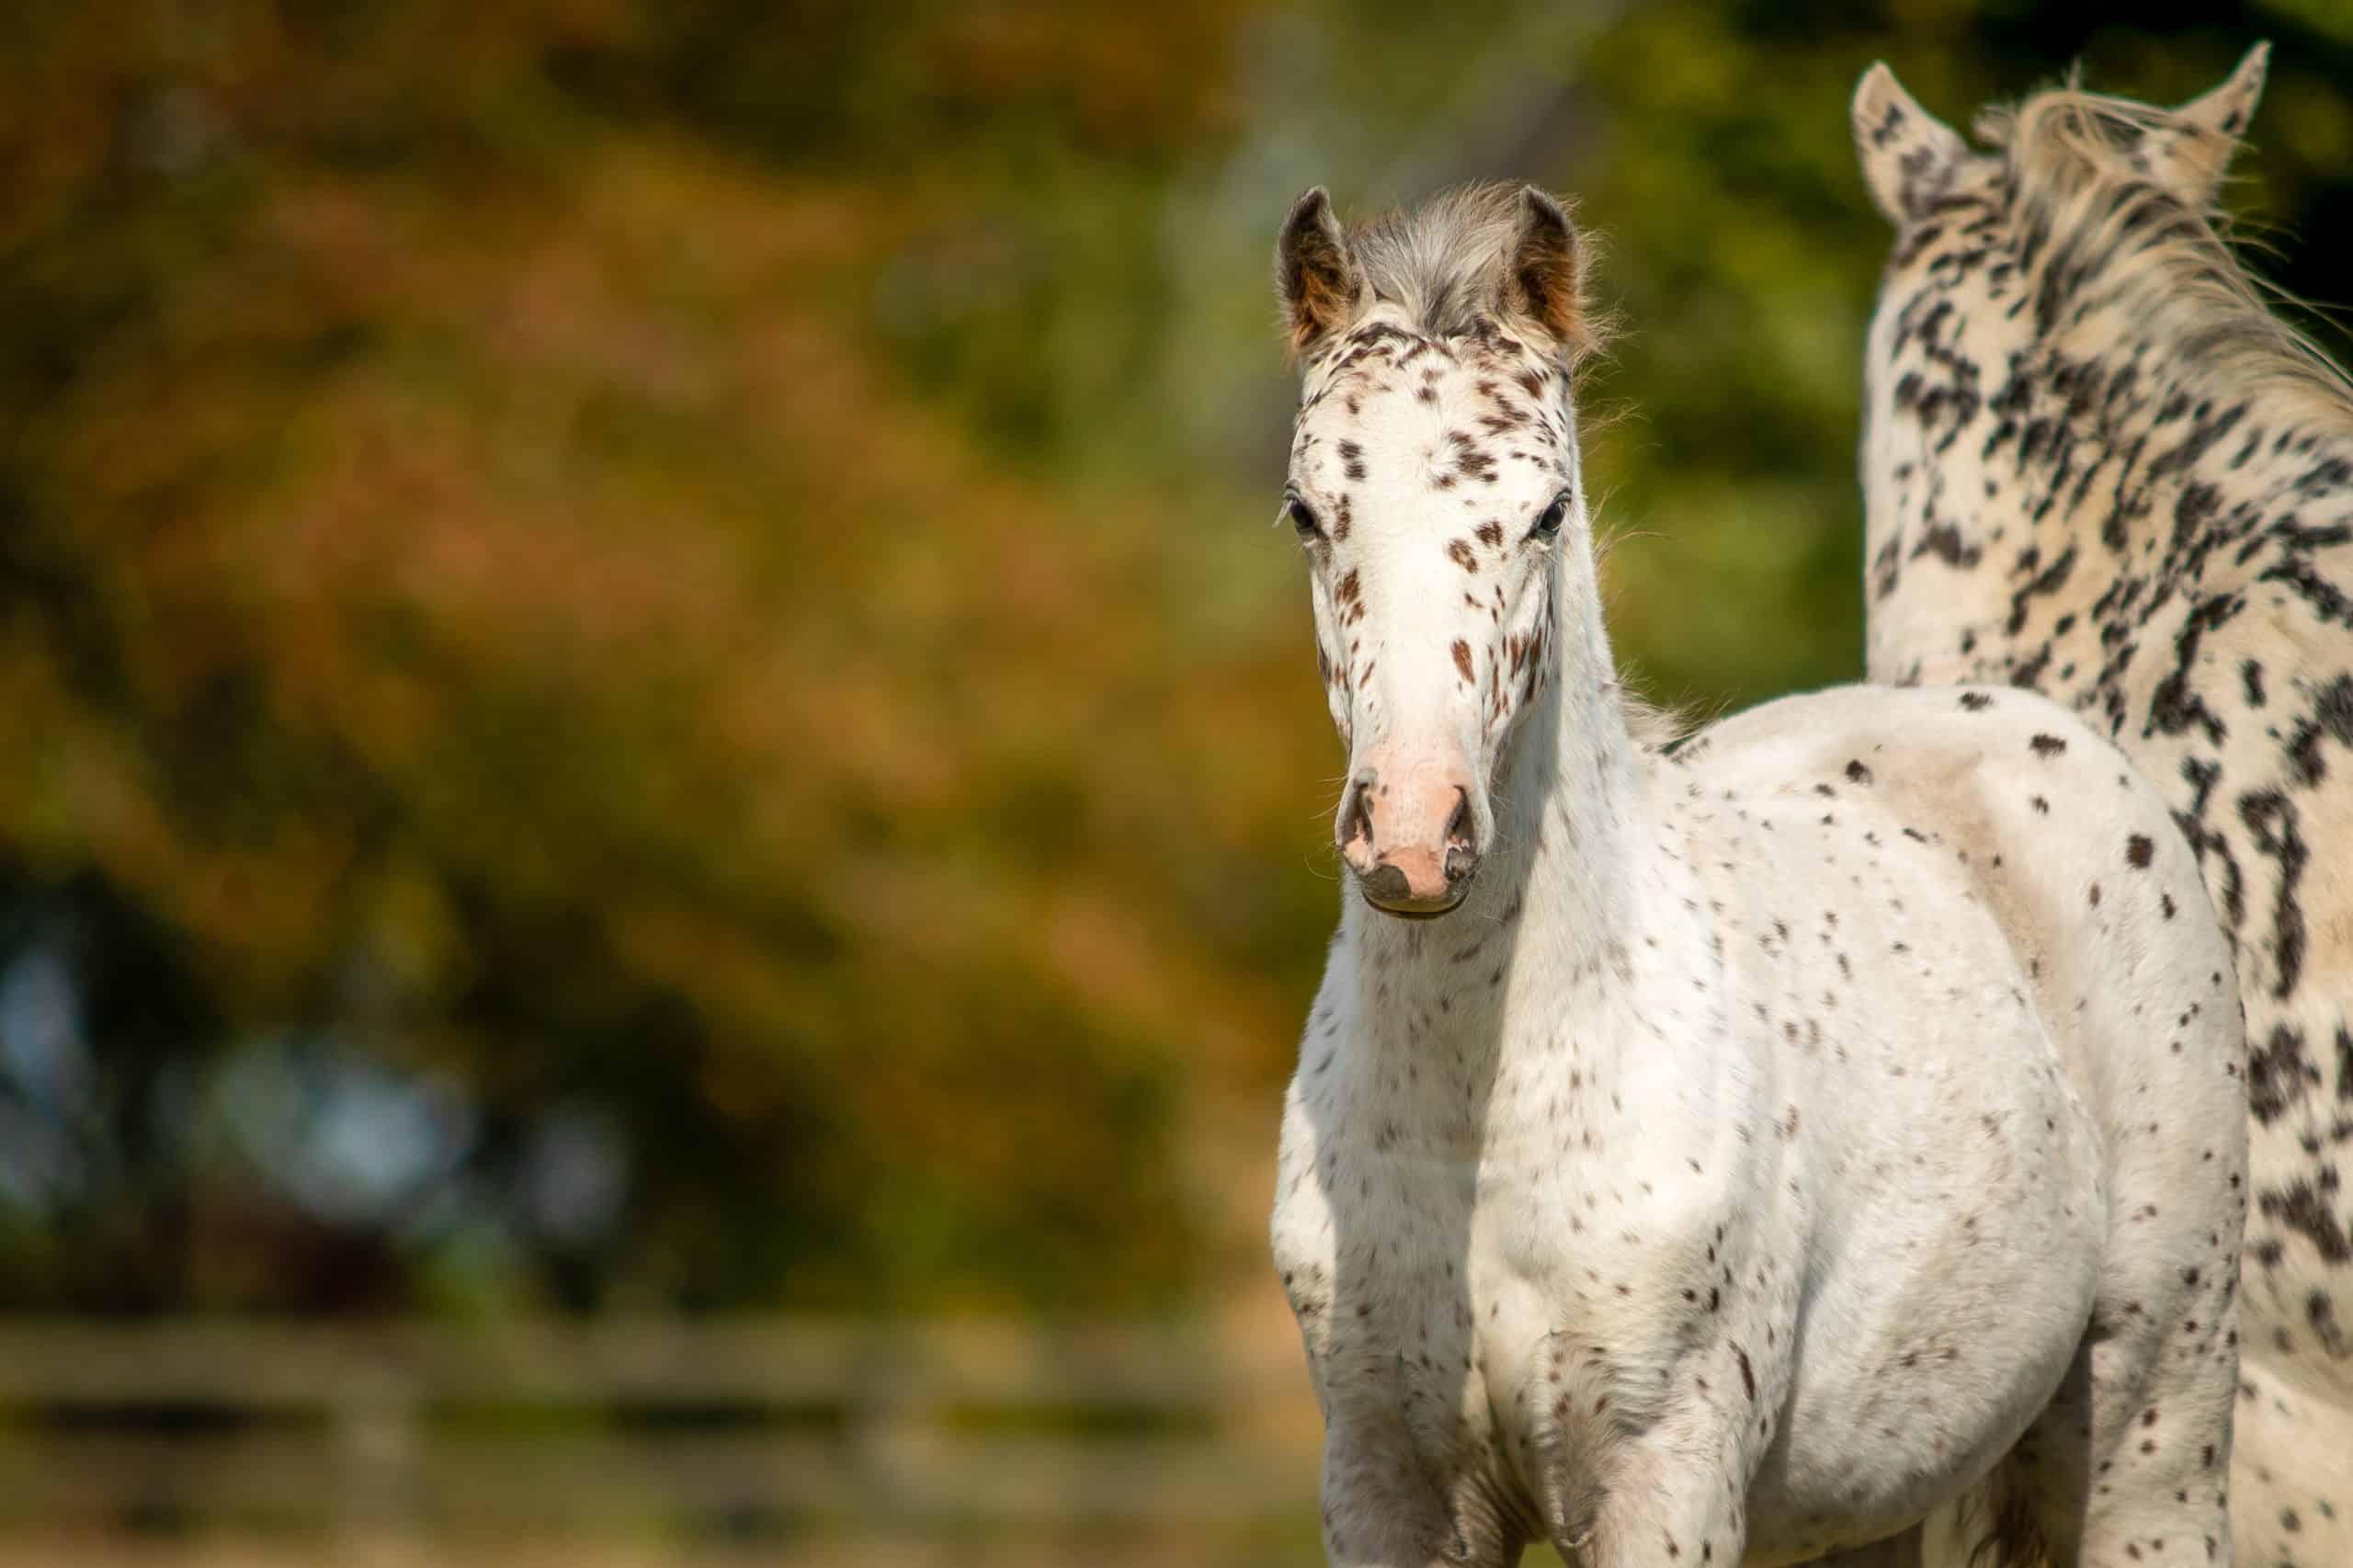 Knabstrupper Appaloosa Spotted Pony Foal in Grass Pasture